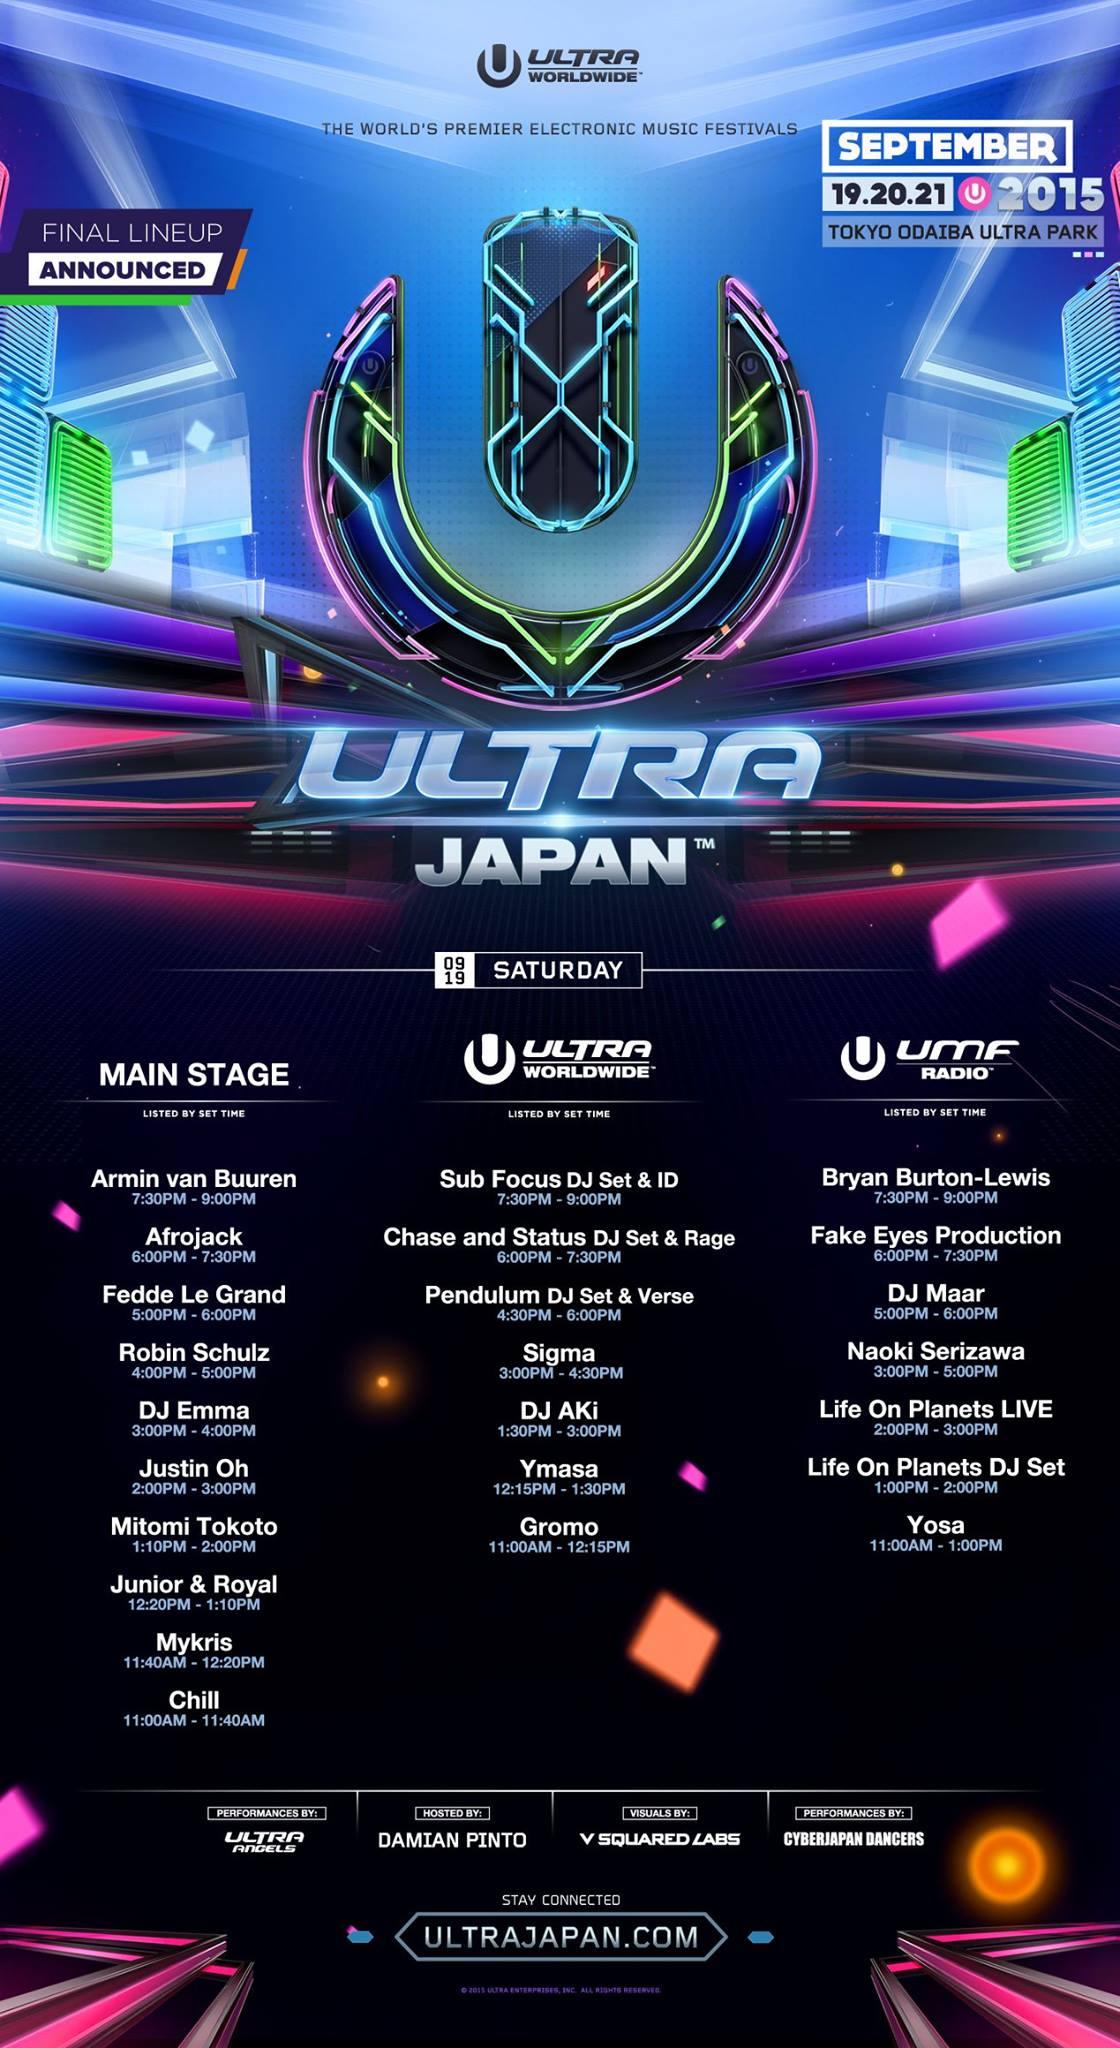 ULTRA JAPAN 2015 DAY 1